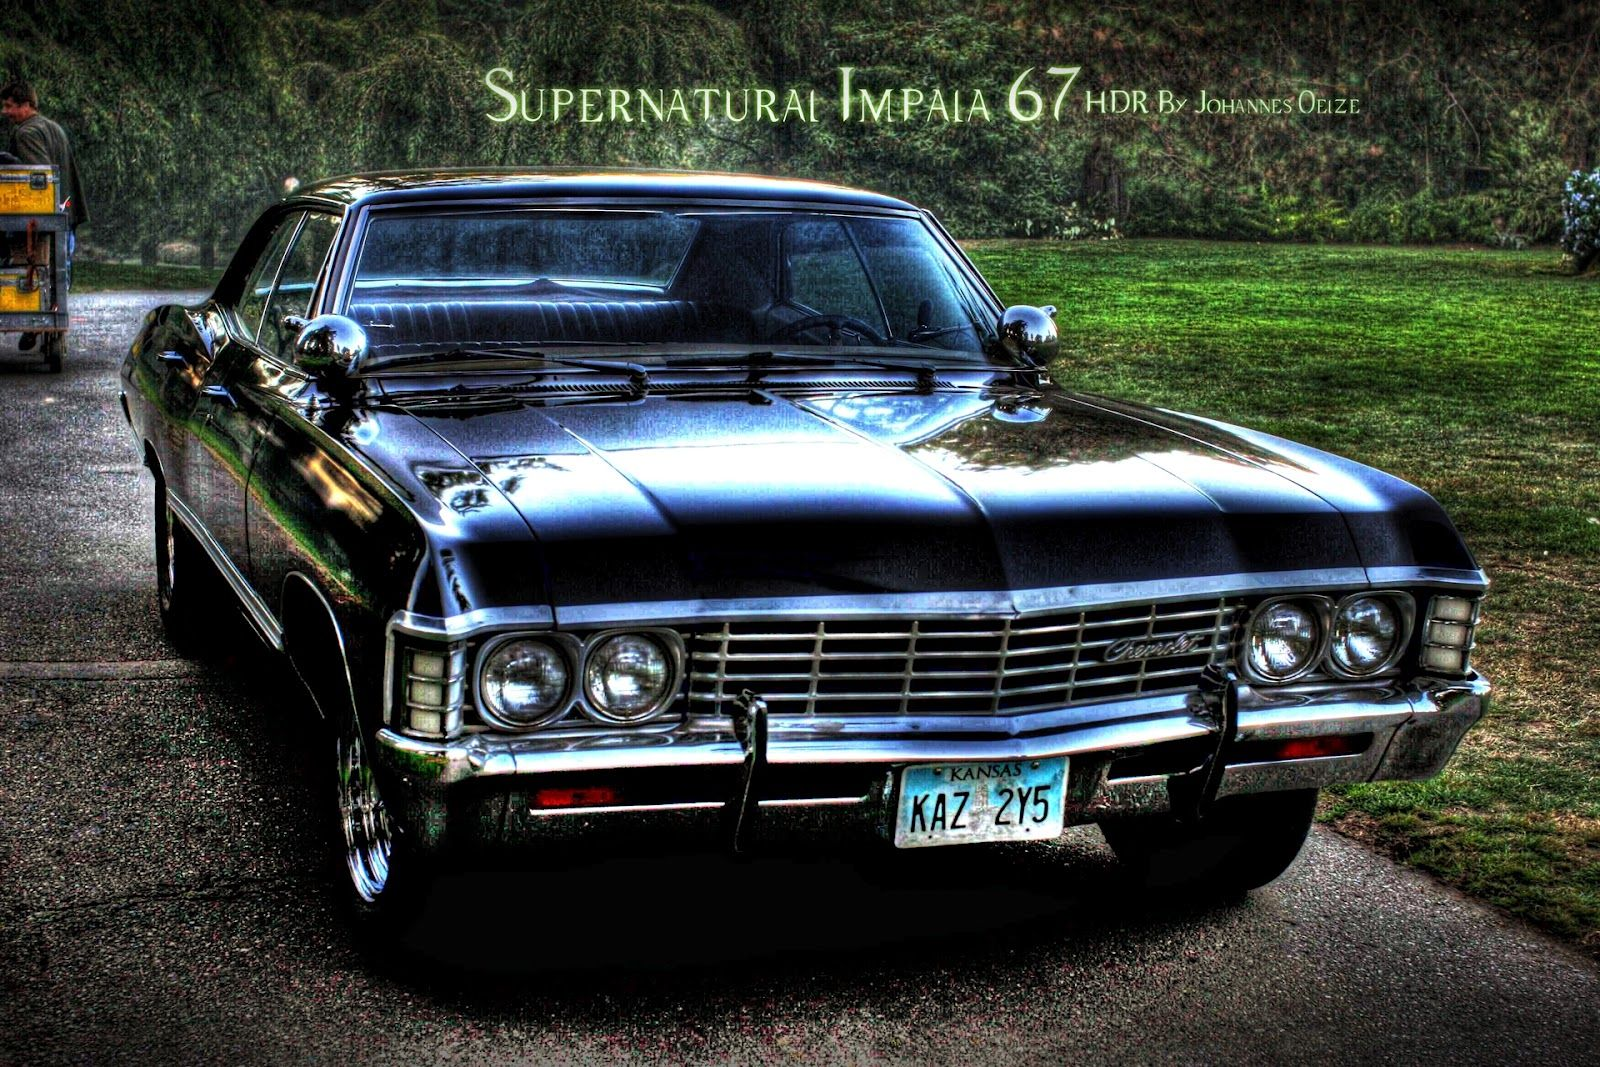 Chevy Impala 67 Raridade Chevy Impala Impala 67 Impala